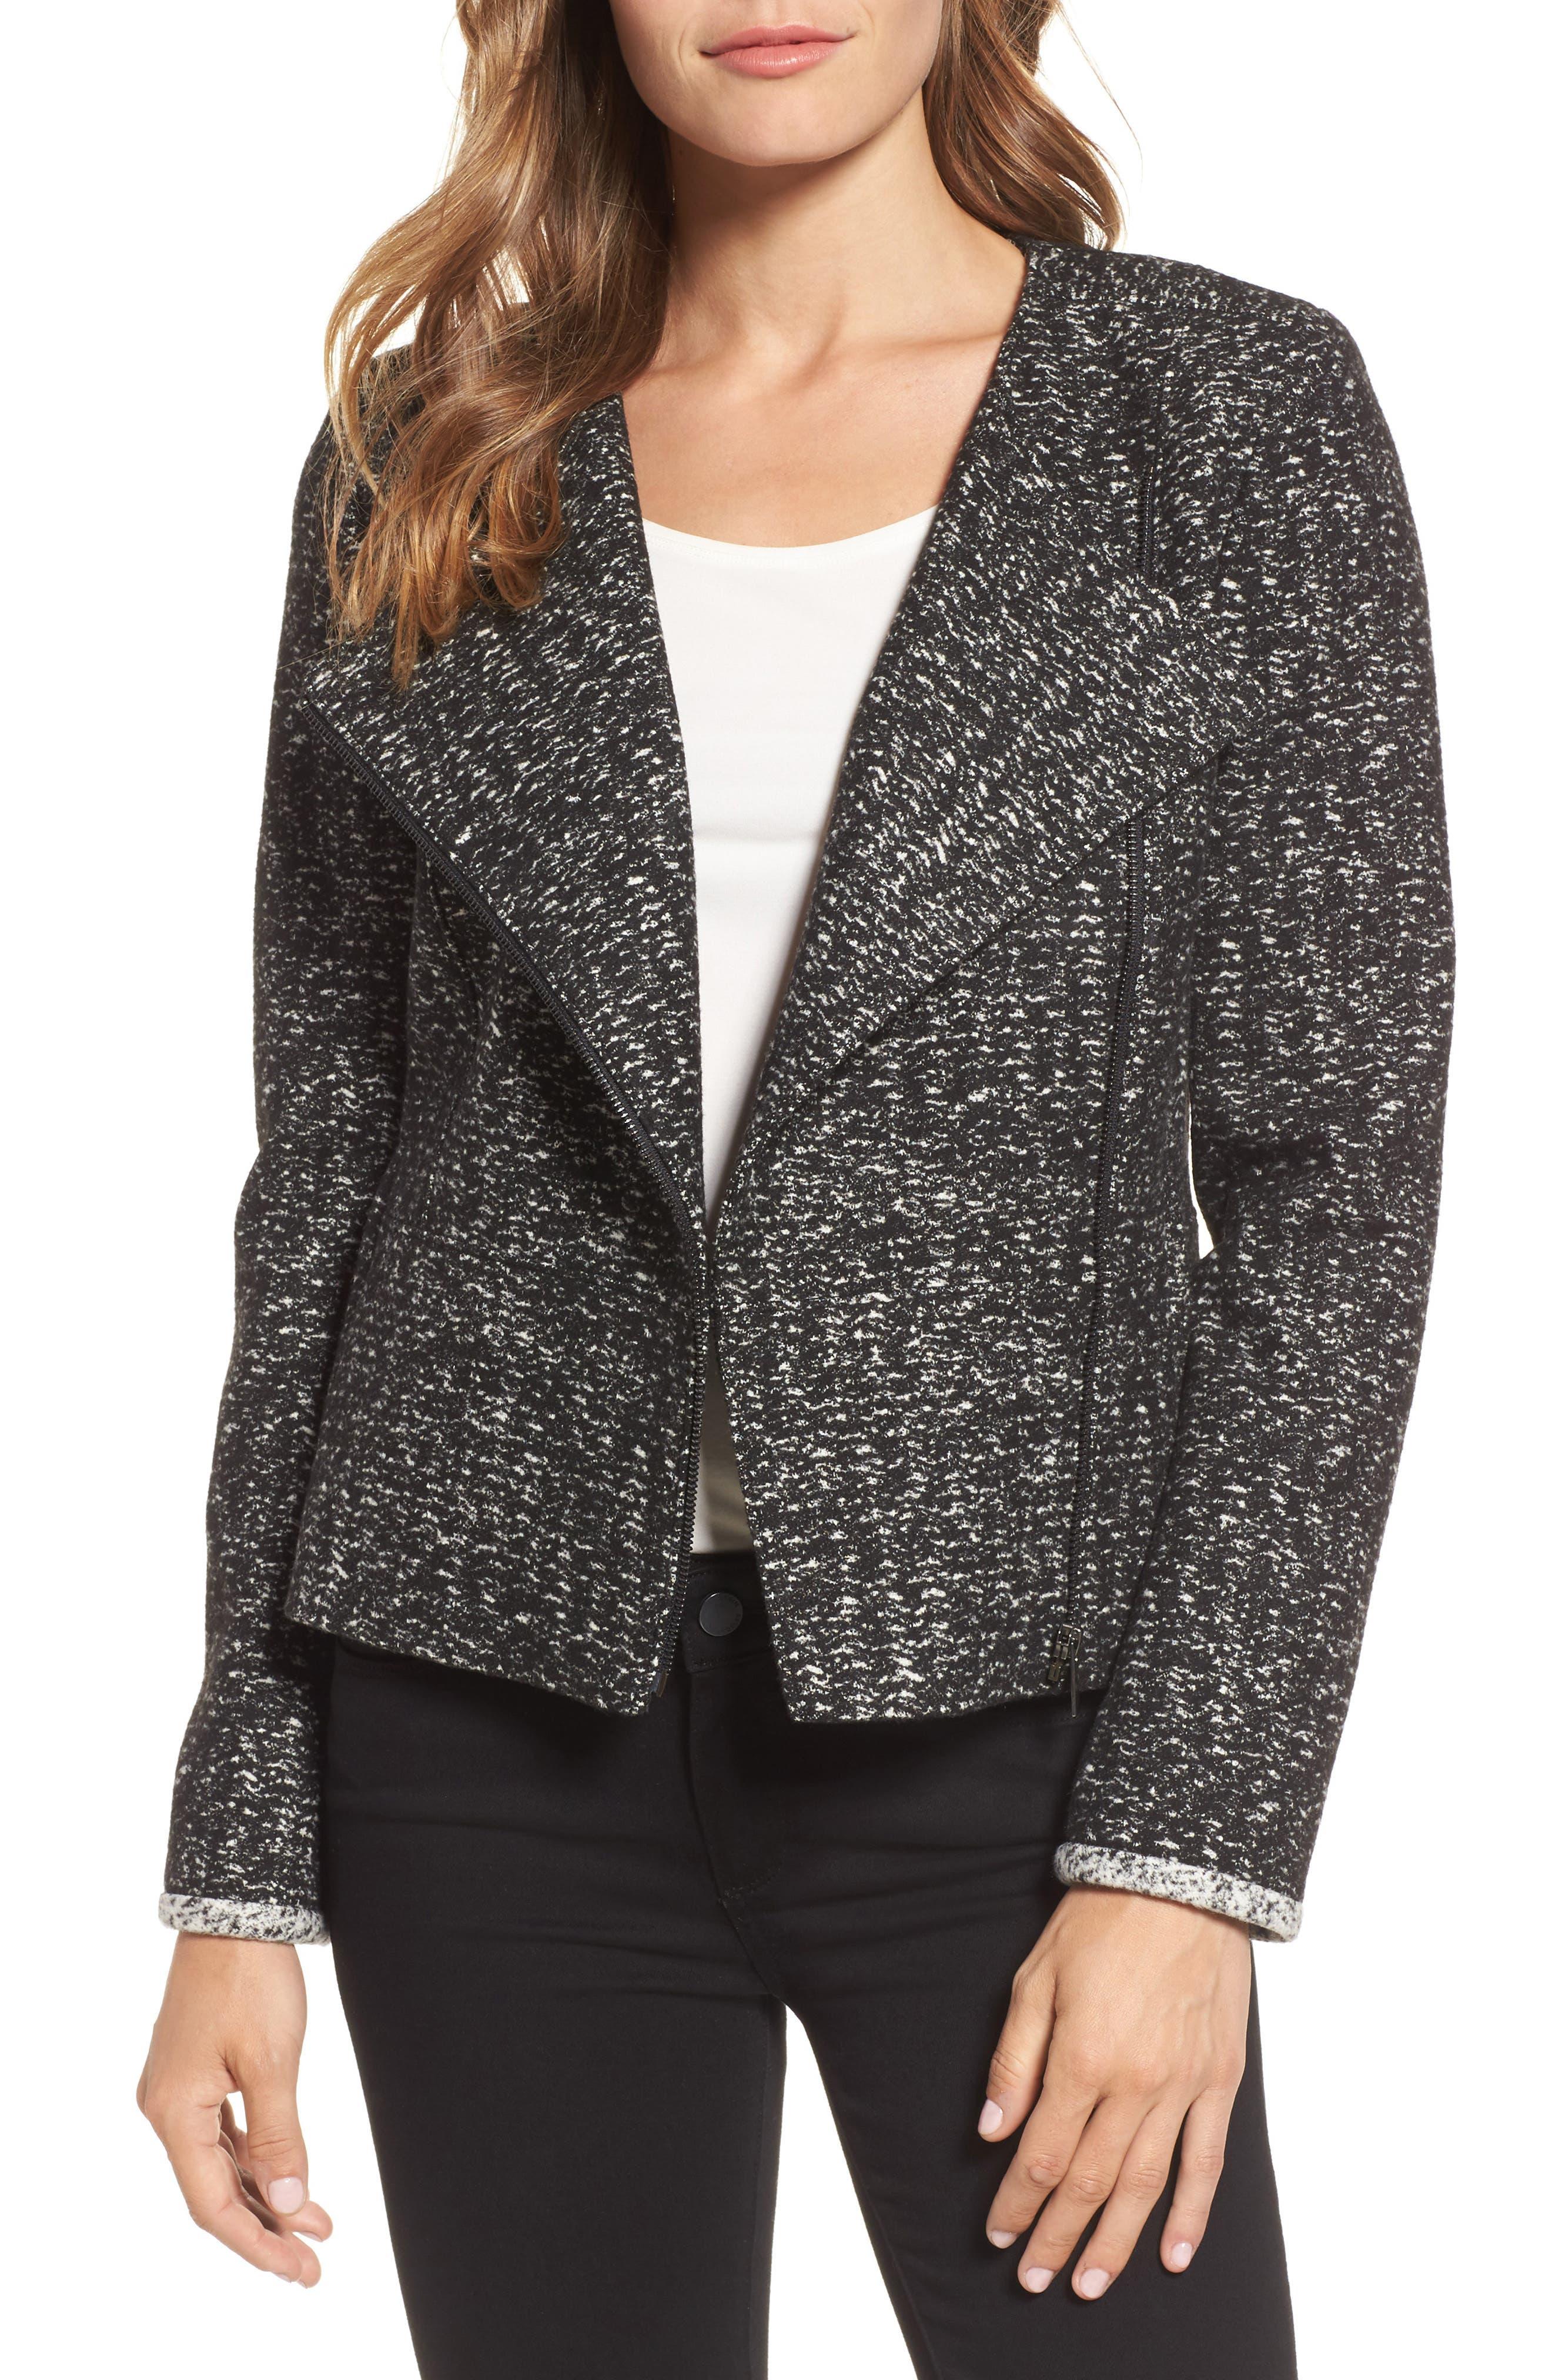 Emerson Rose Contrast Trim Jacket